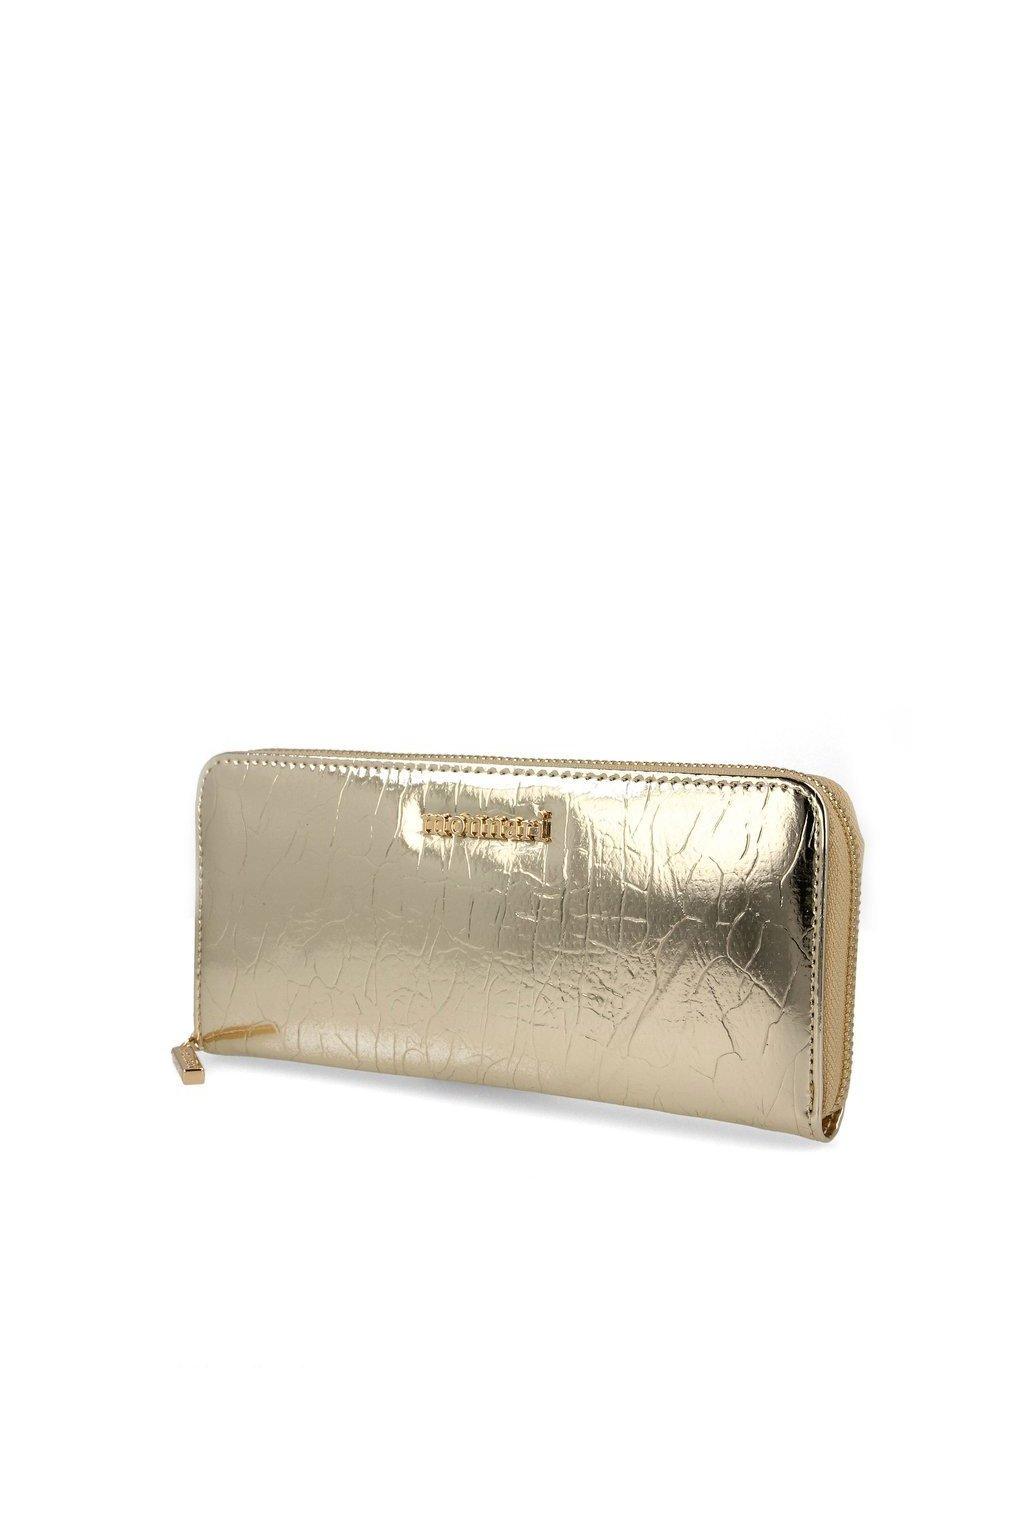 Peňaženka farba žltá kód PUR0100-M23